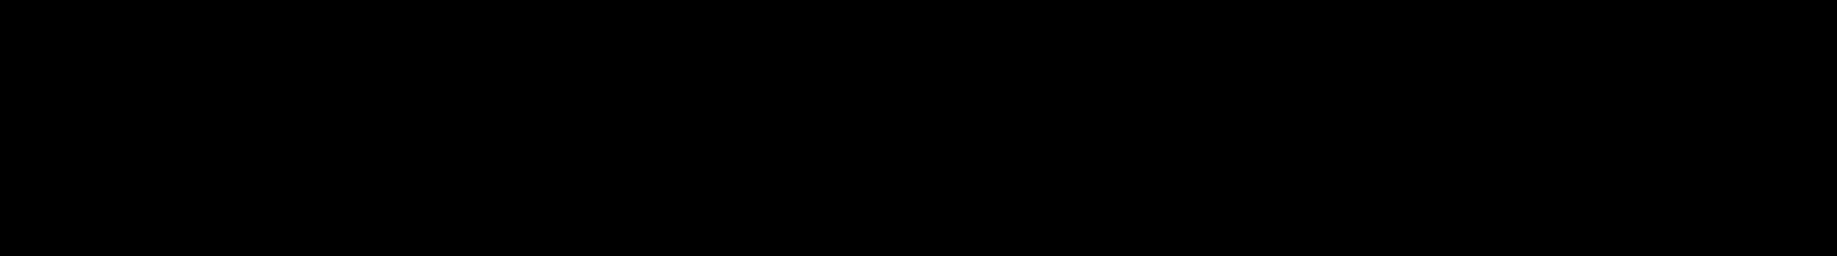 TT -26